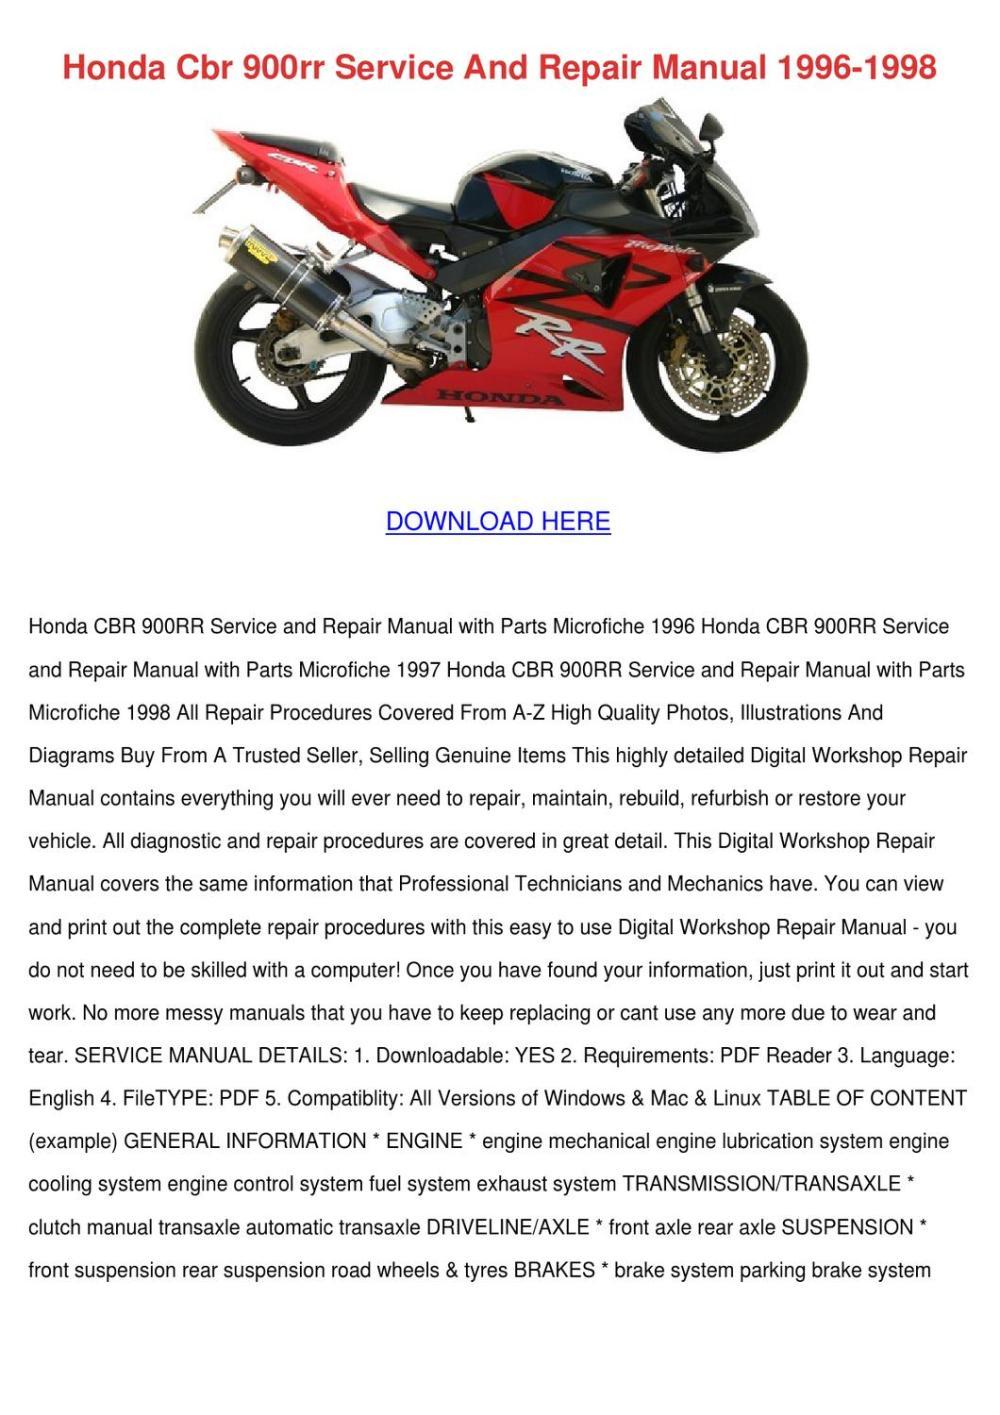 medium resolution of honda cbr 900rr service and repair manual 199 by reda mccrady issuu